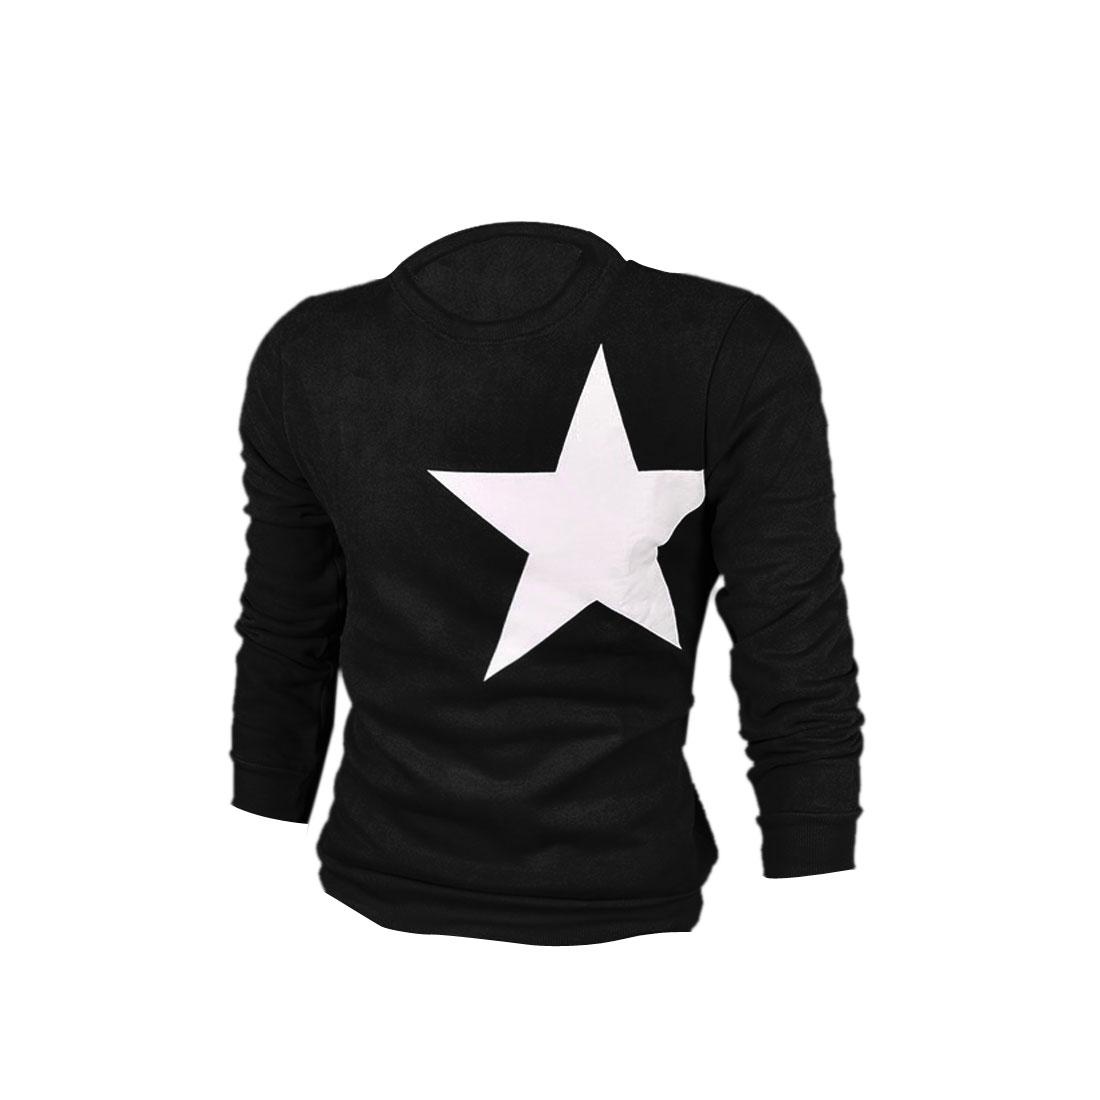 Mens New Fashion Round Neck Long Sleeve Star Pattern Black Sweatshirt L